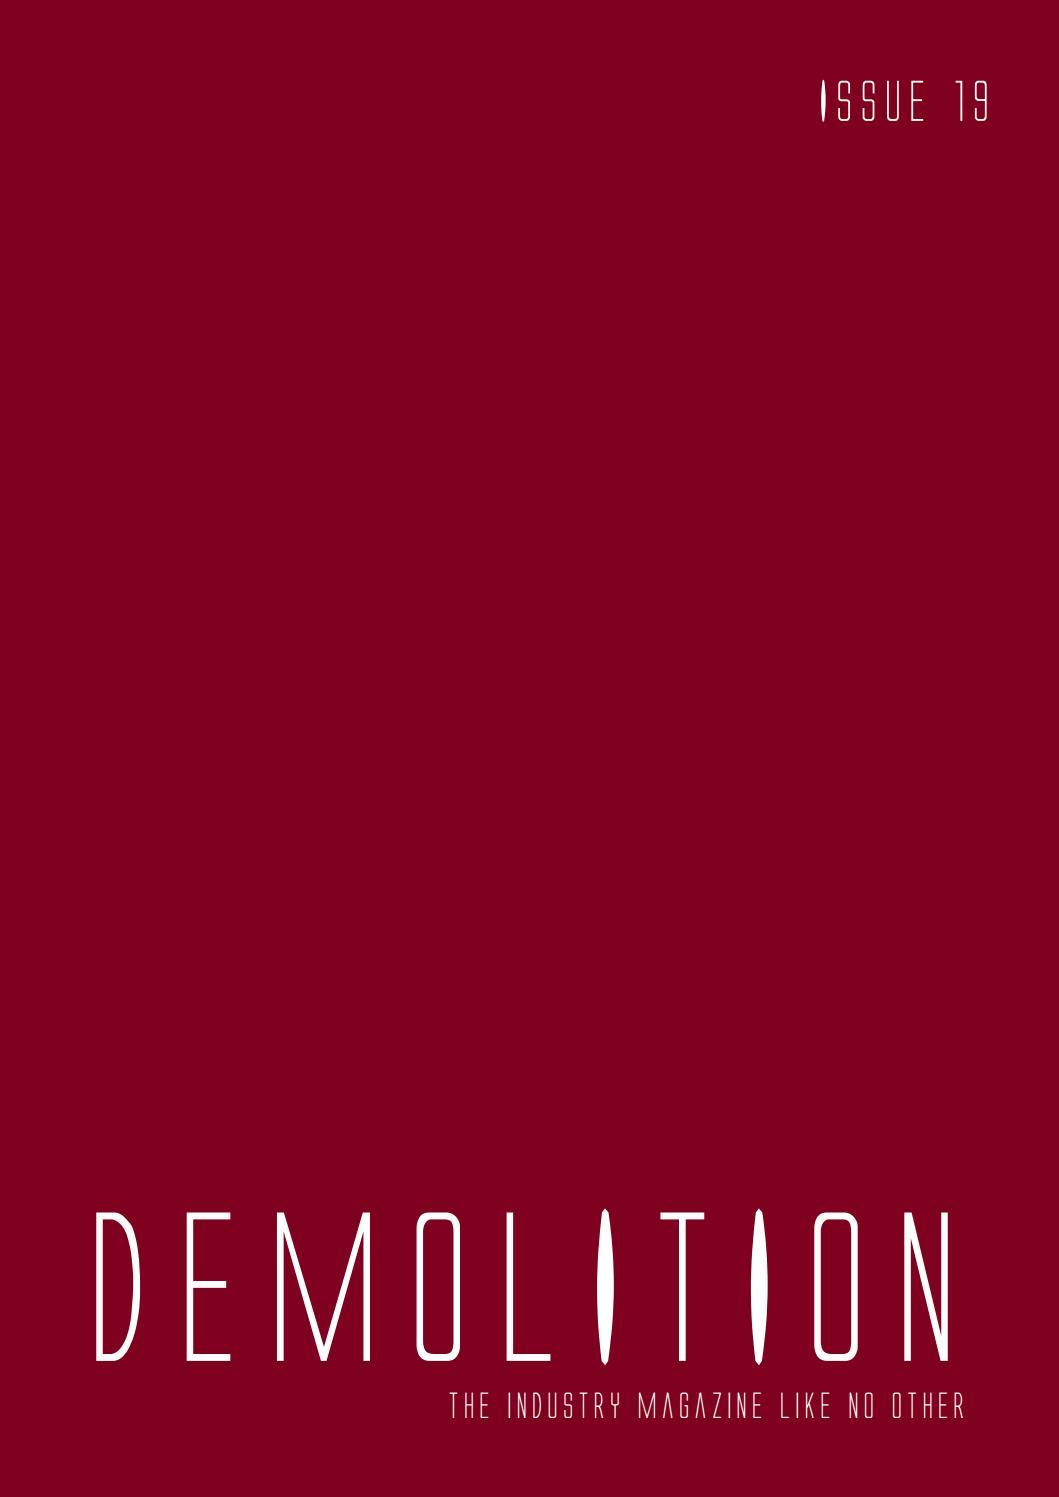 Demolition magazine - Issue 19 by Mark Anthony - issuu